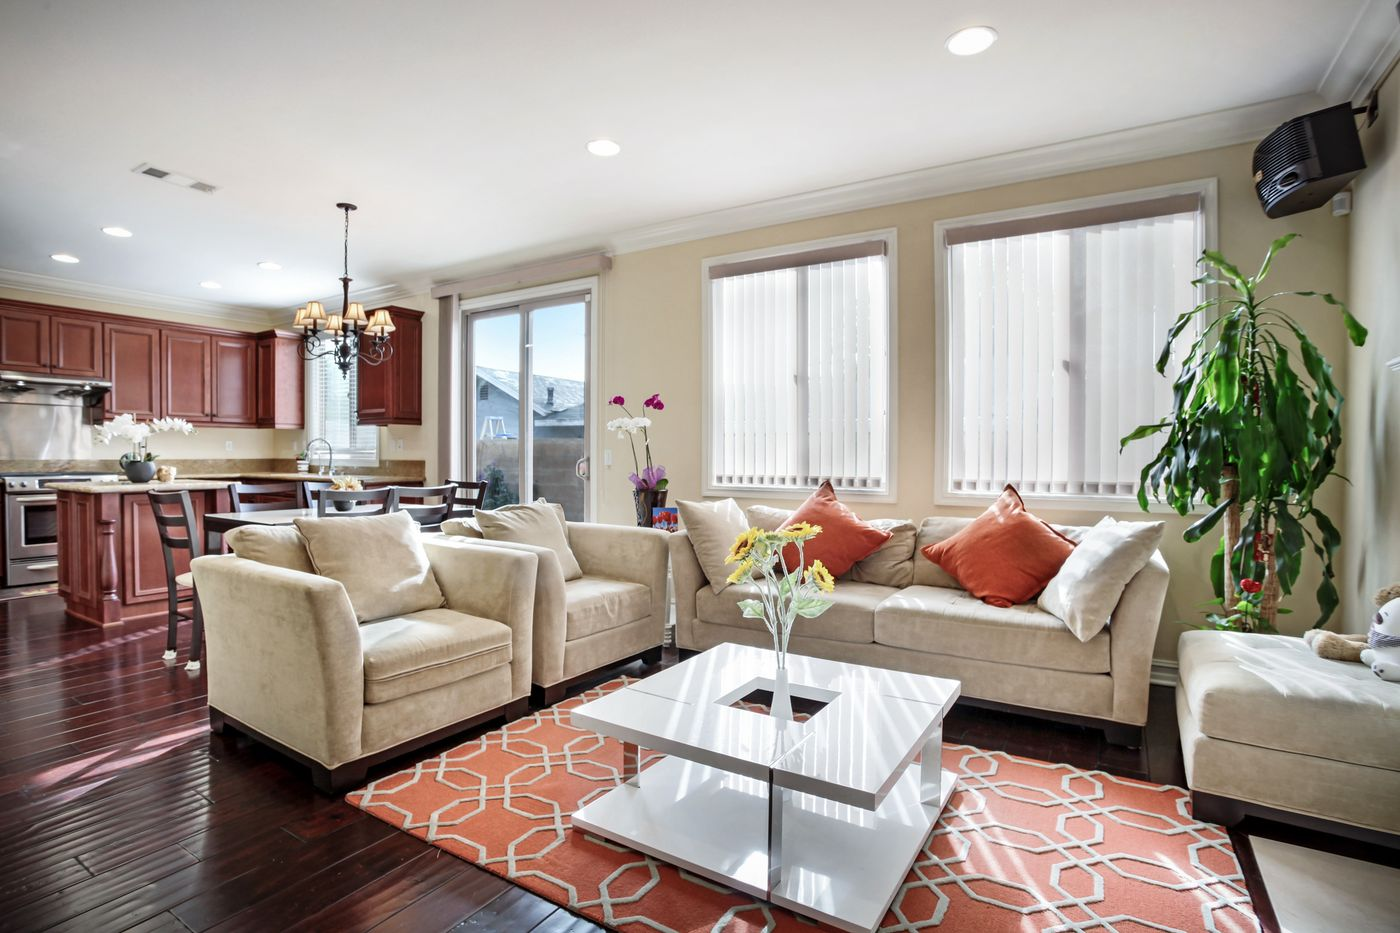 real-estate-photography-los-angeles-pasadena-glendale-burbank-5015 Farago Ave-Temple City-photographer-8